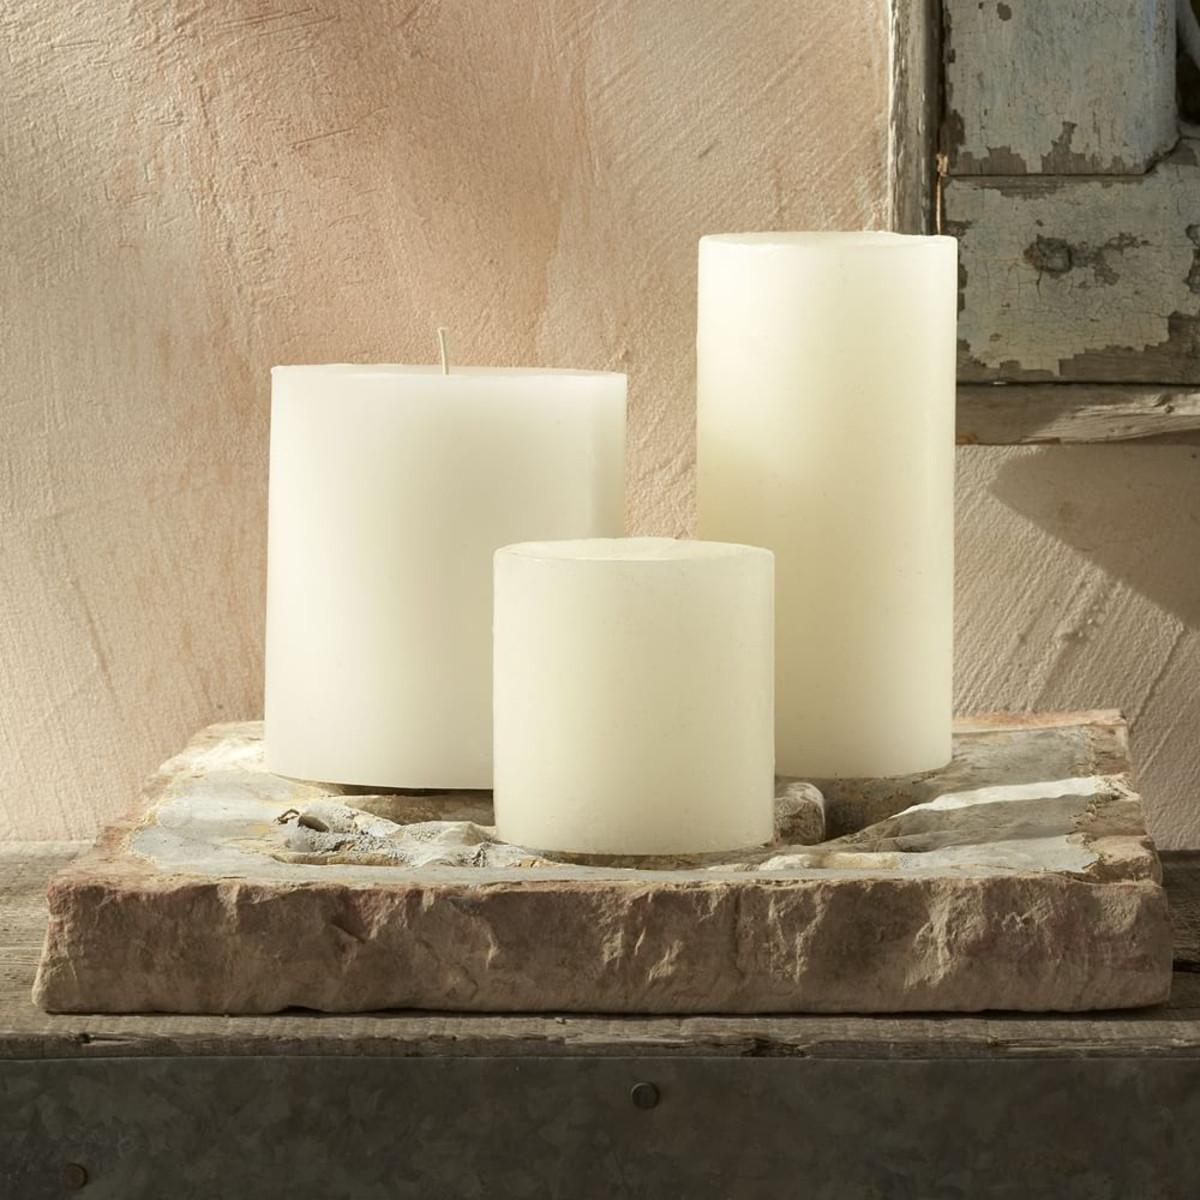 WE-unscented-round-pillar-candles-a026-zoom.jpg